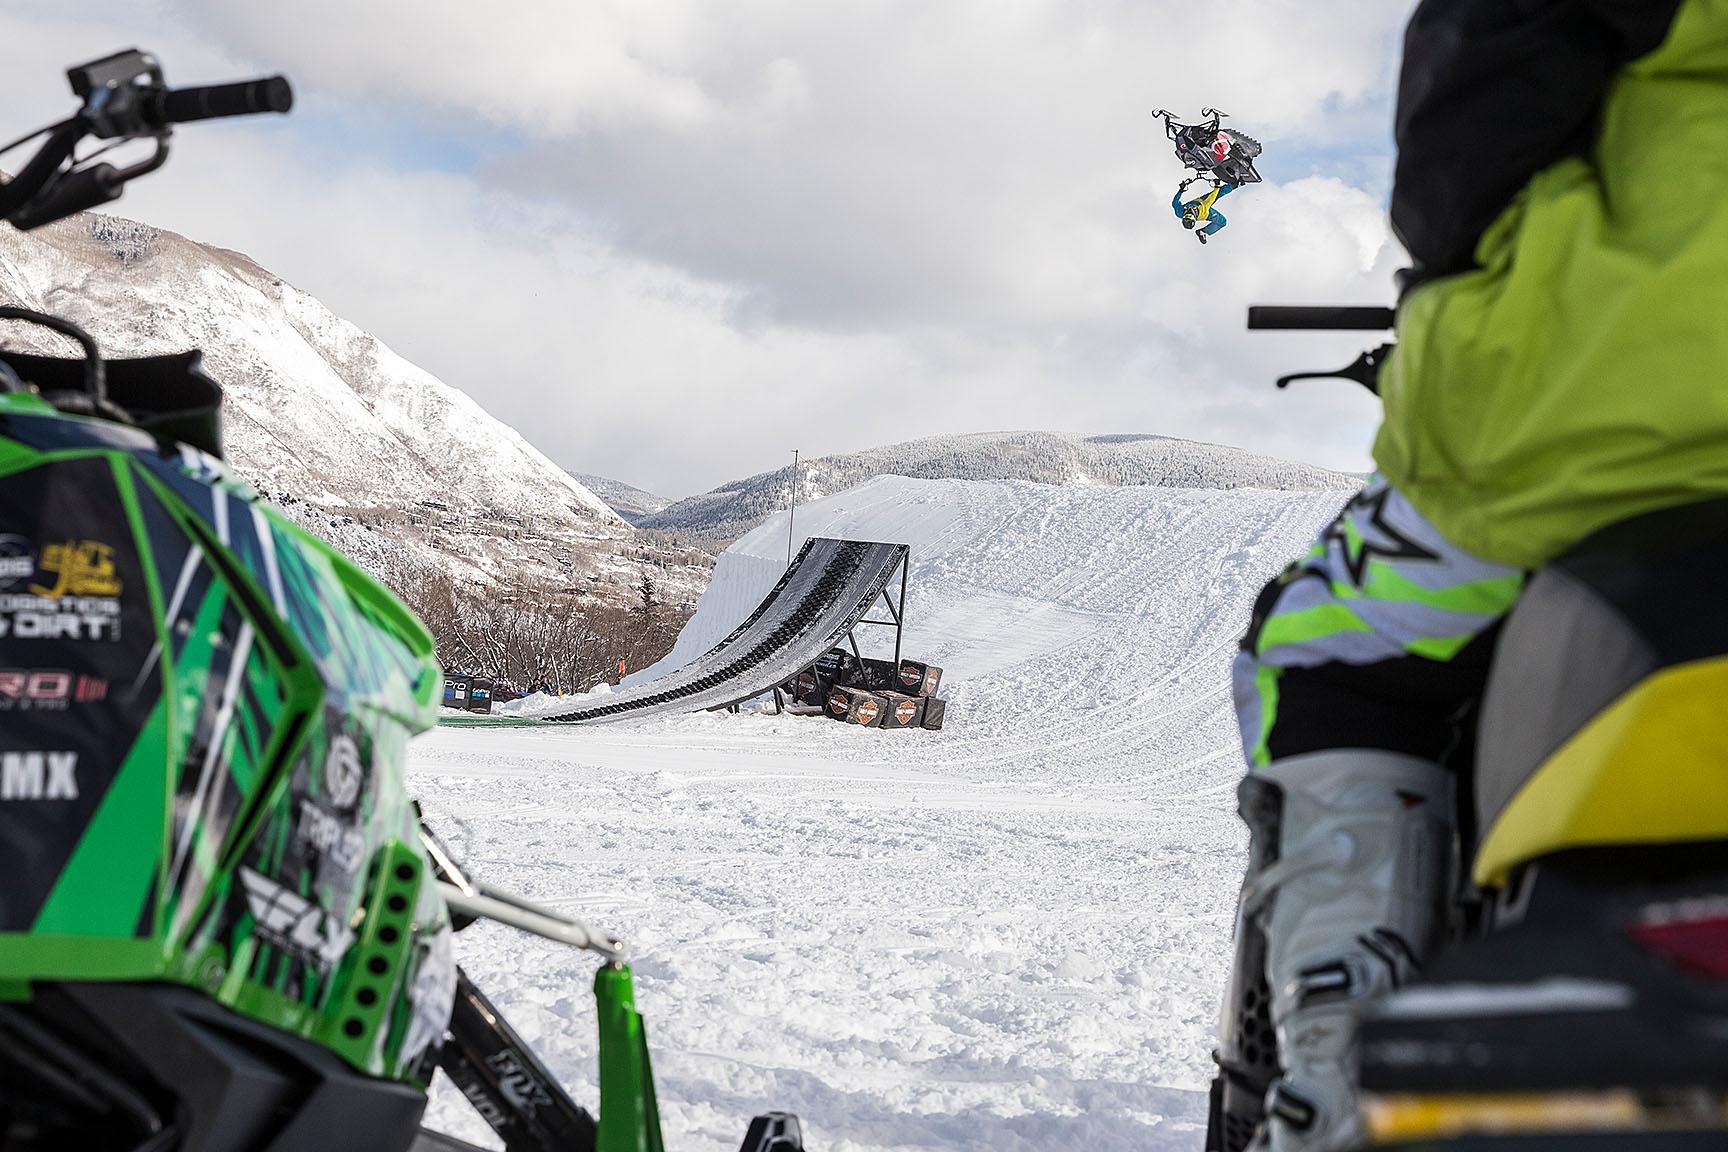 Josh Penner, Freestyle Snowmobile practice